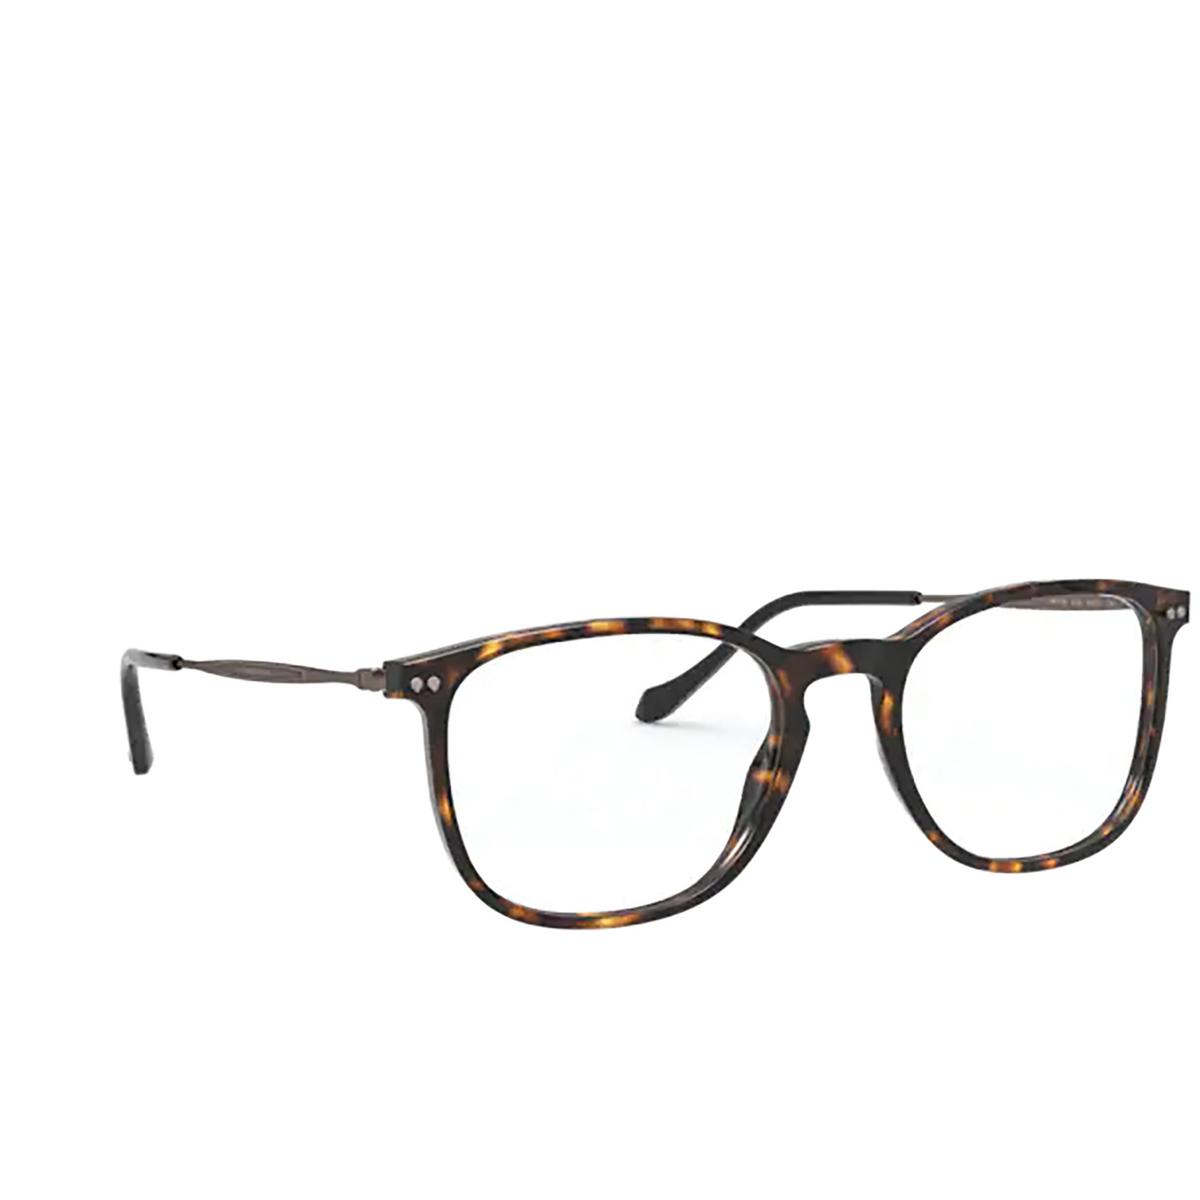 Giorgio Armani® Rectangle Eyeglasses: AR7190 color Dark Havana 5026 - three-quarters view.